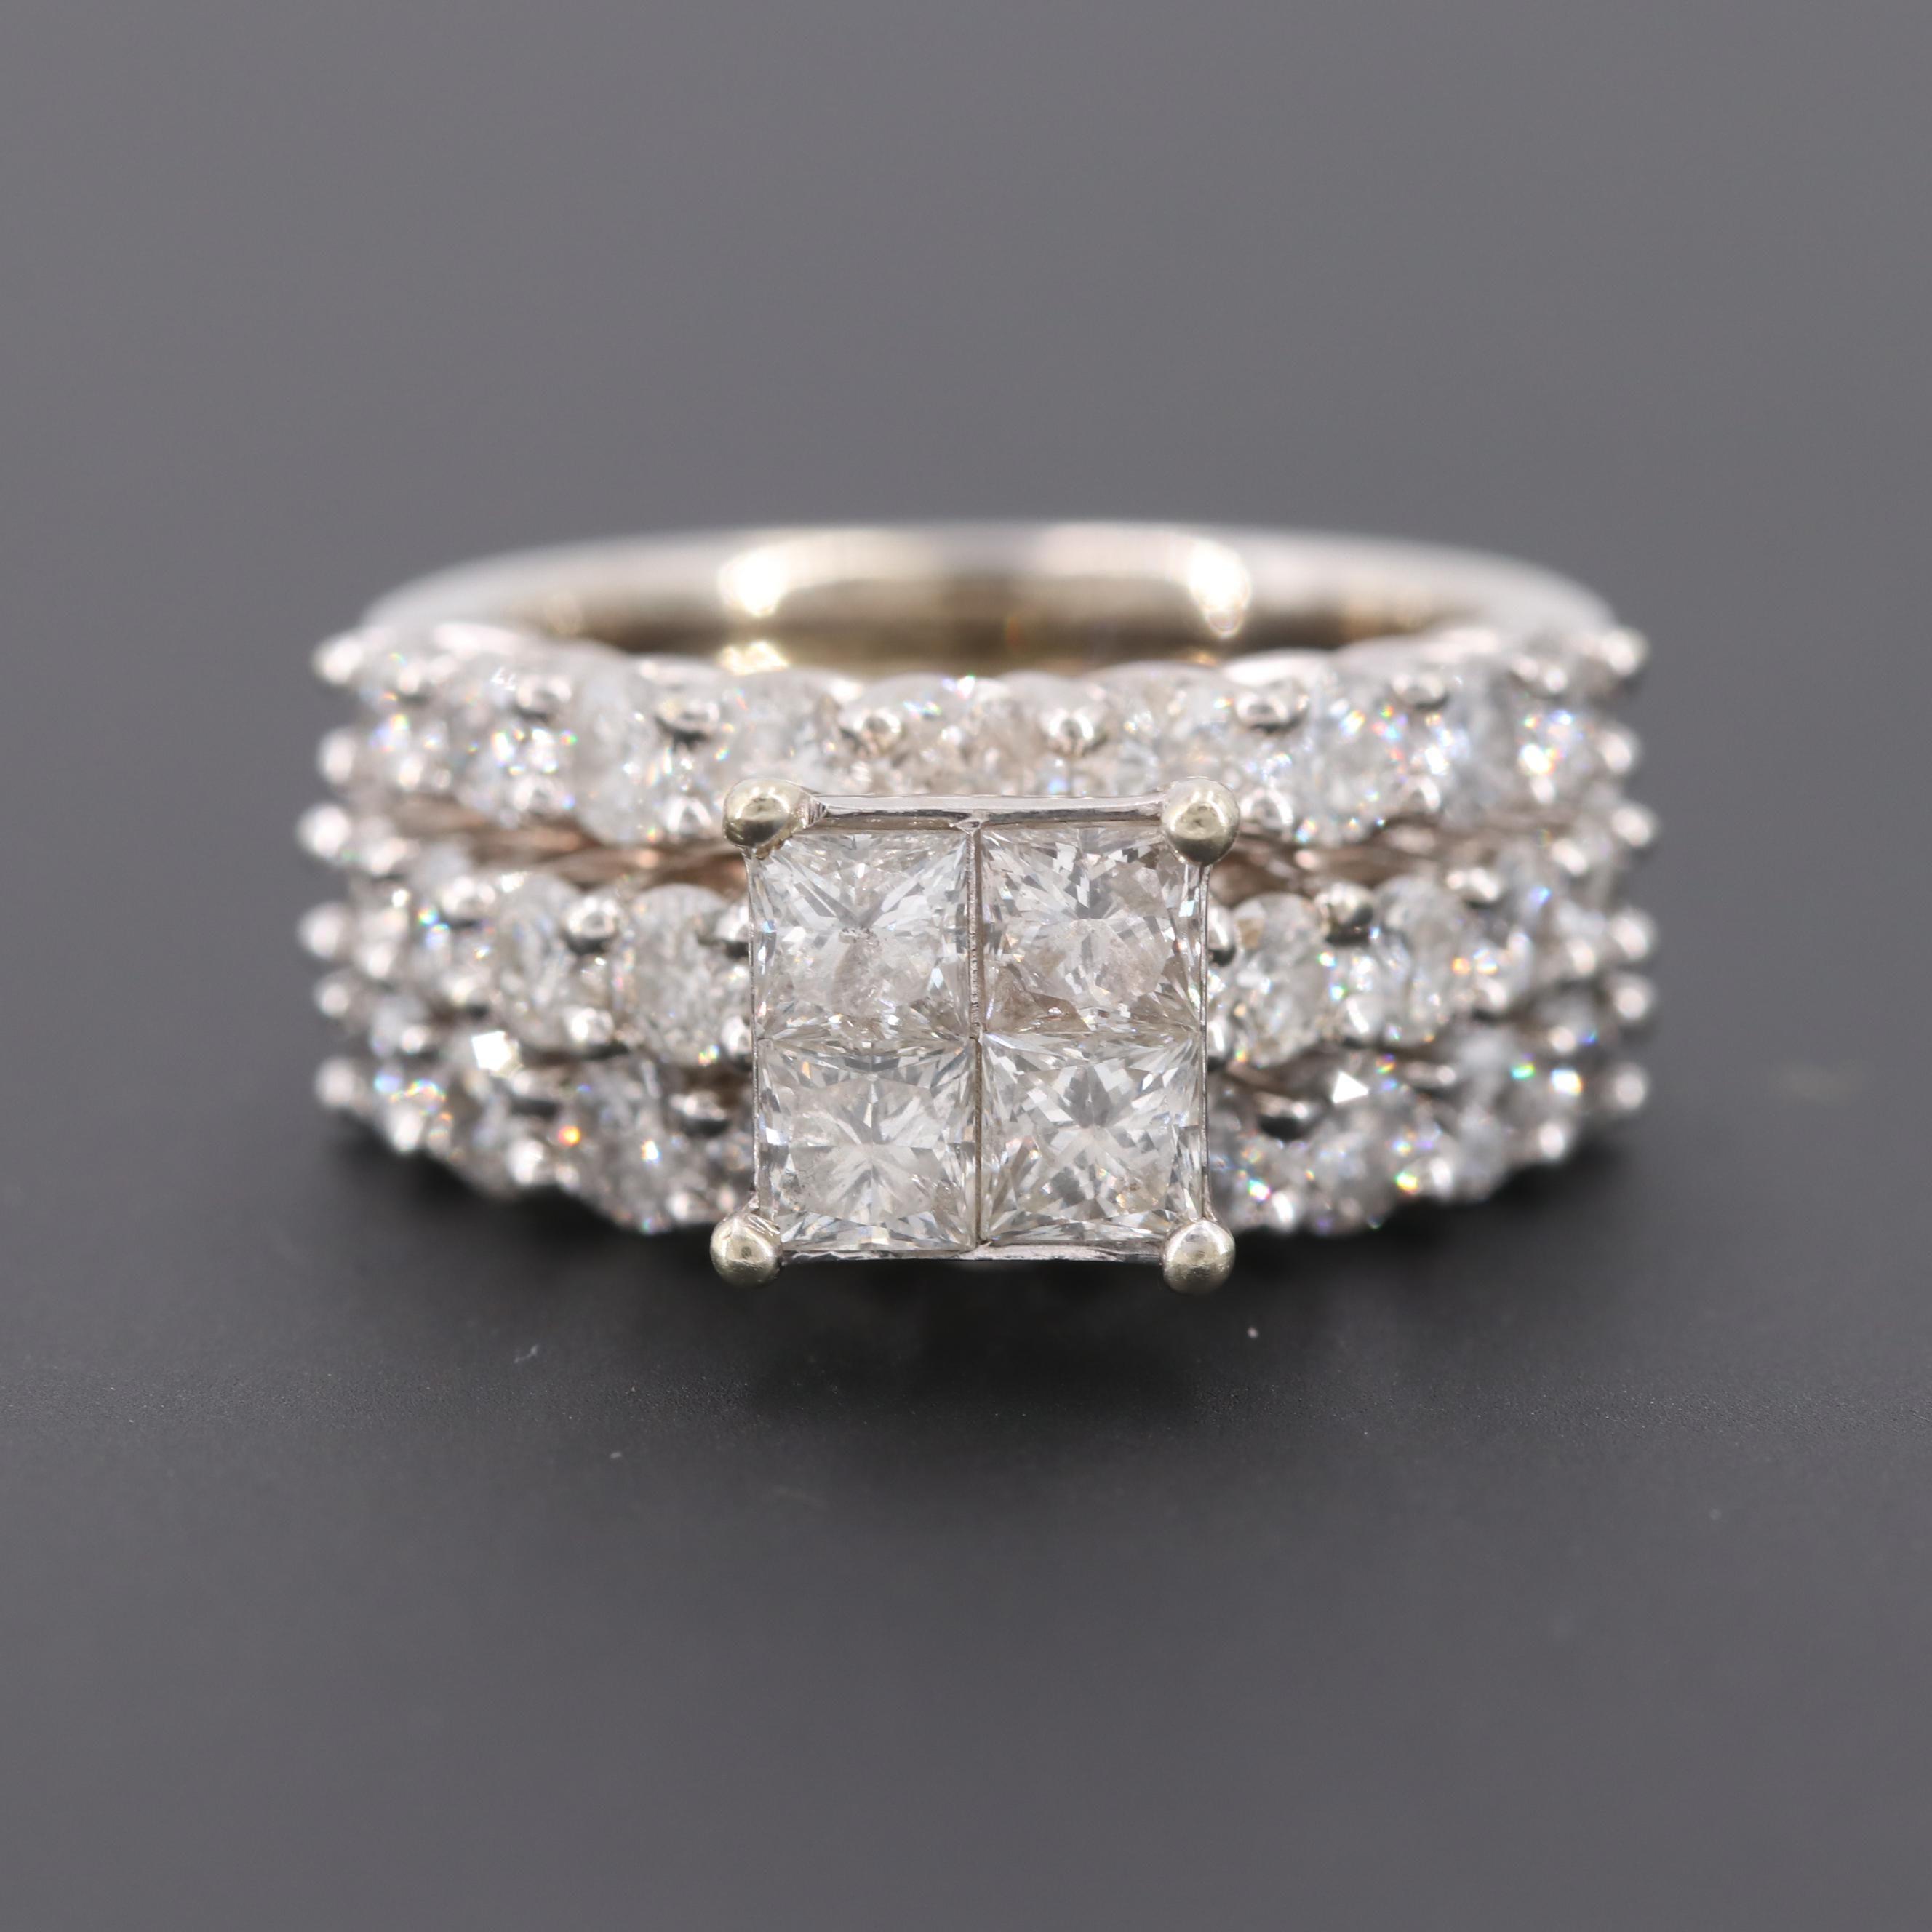 14K White Gold 4.06 CTW Diamond Ring